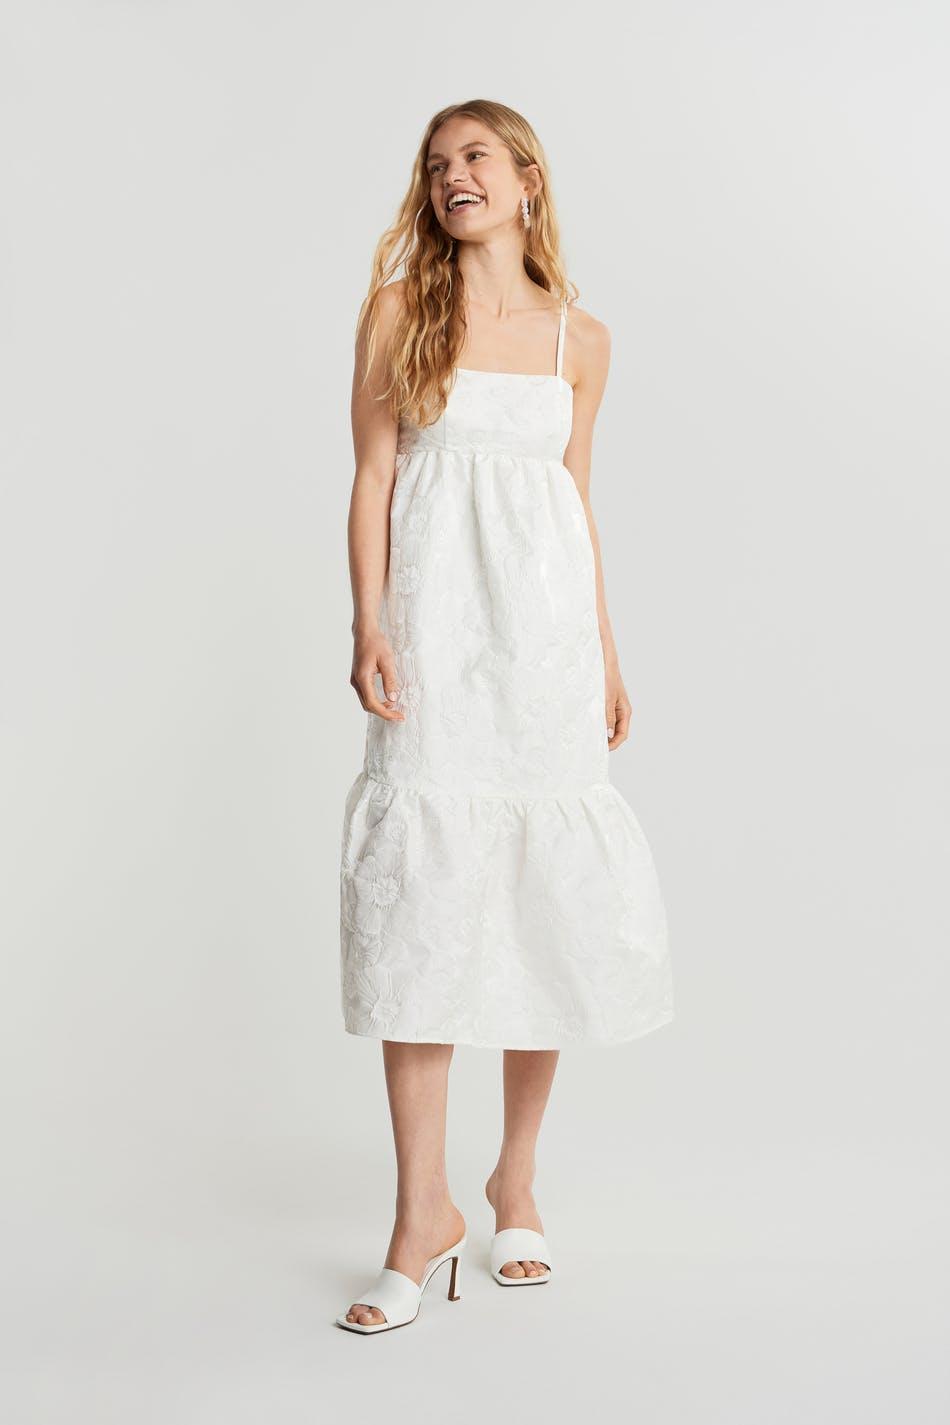 Gina Tricot Lizette dress